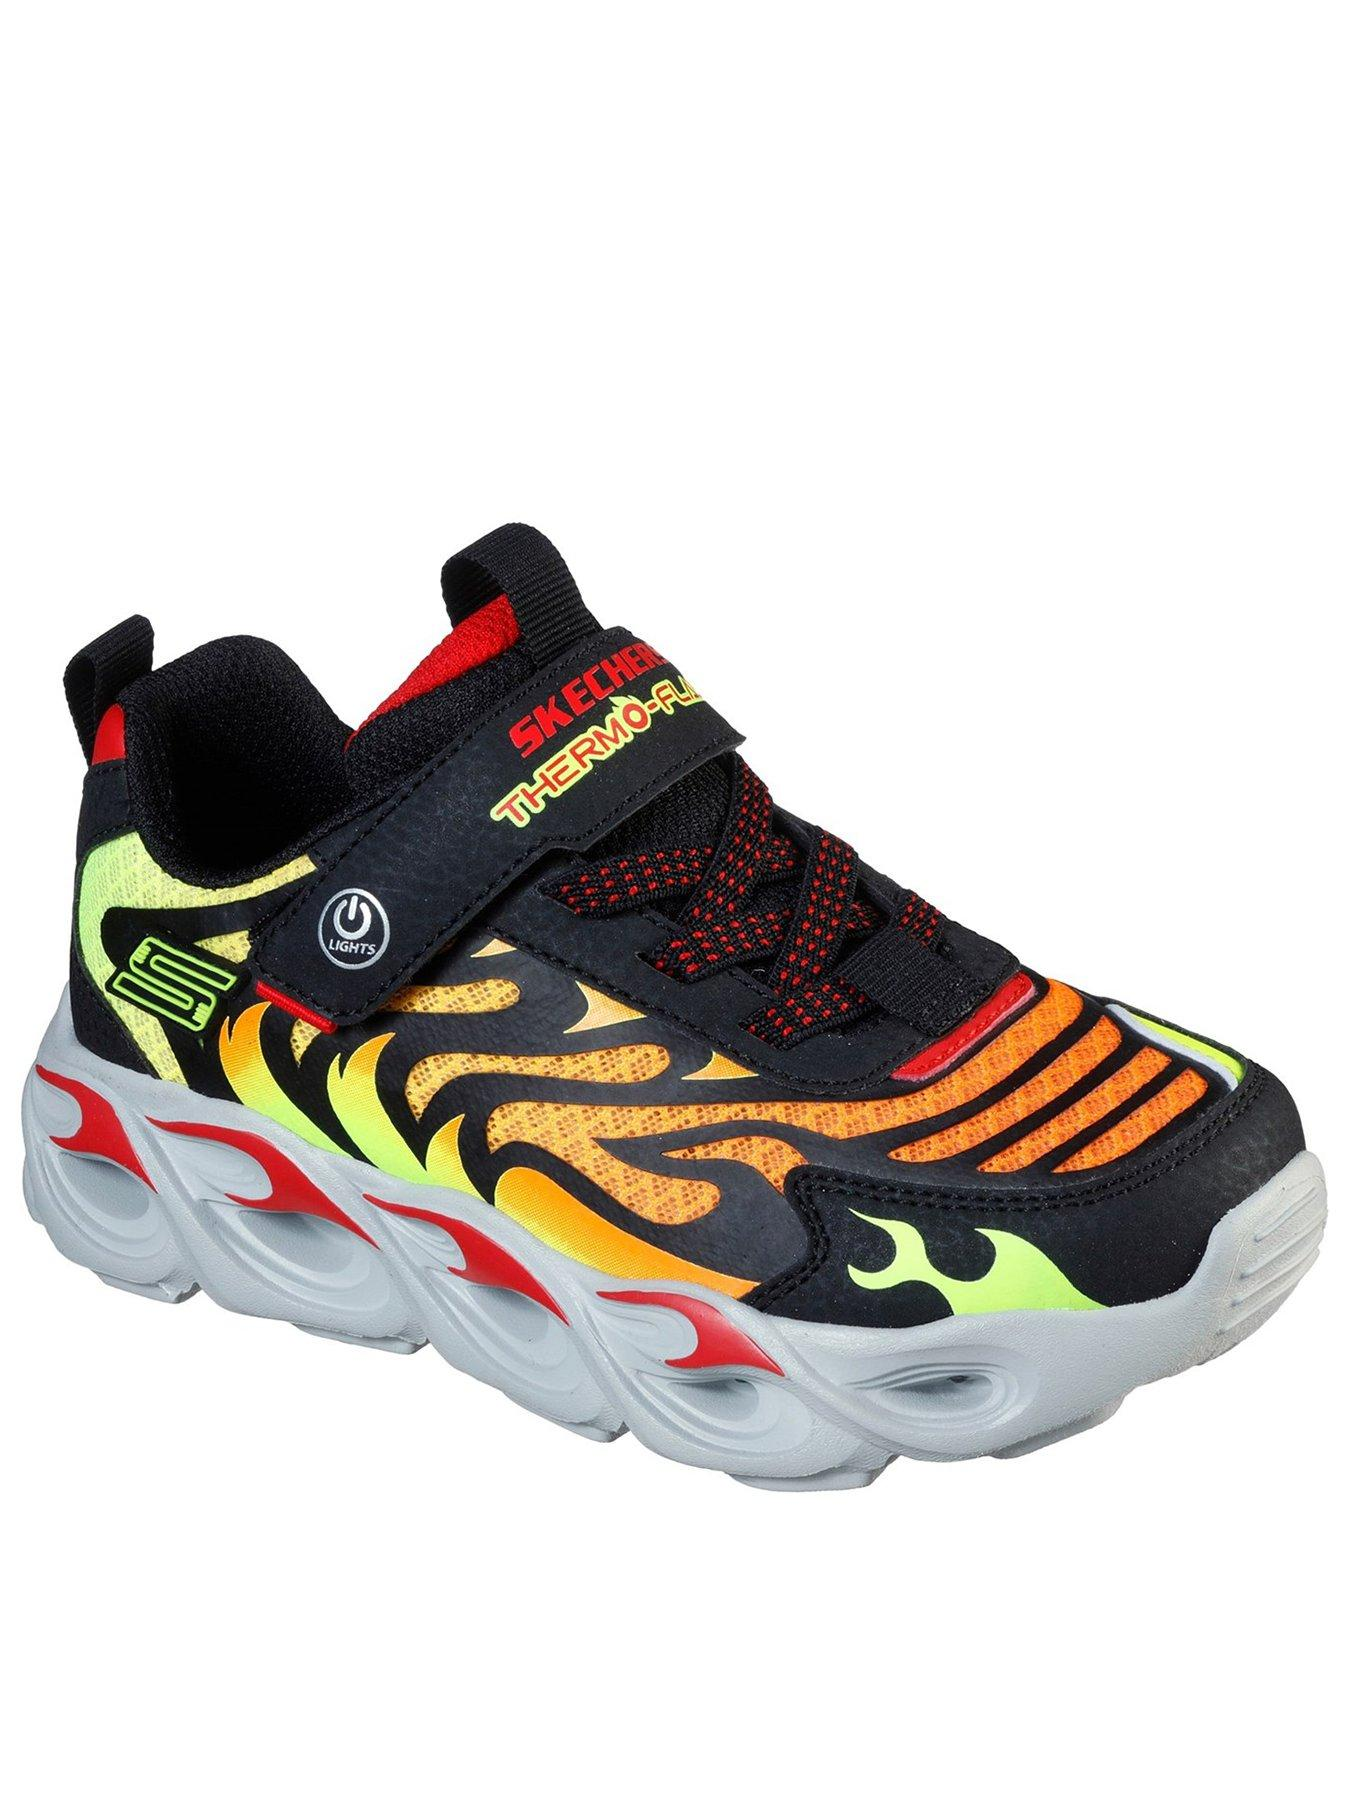 Kids Trainers \u0026 Runners For Boys